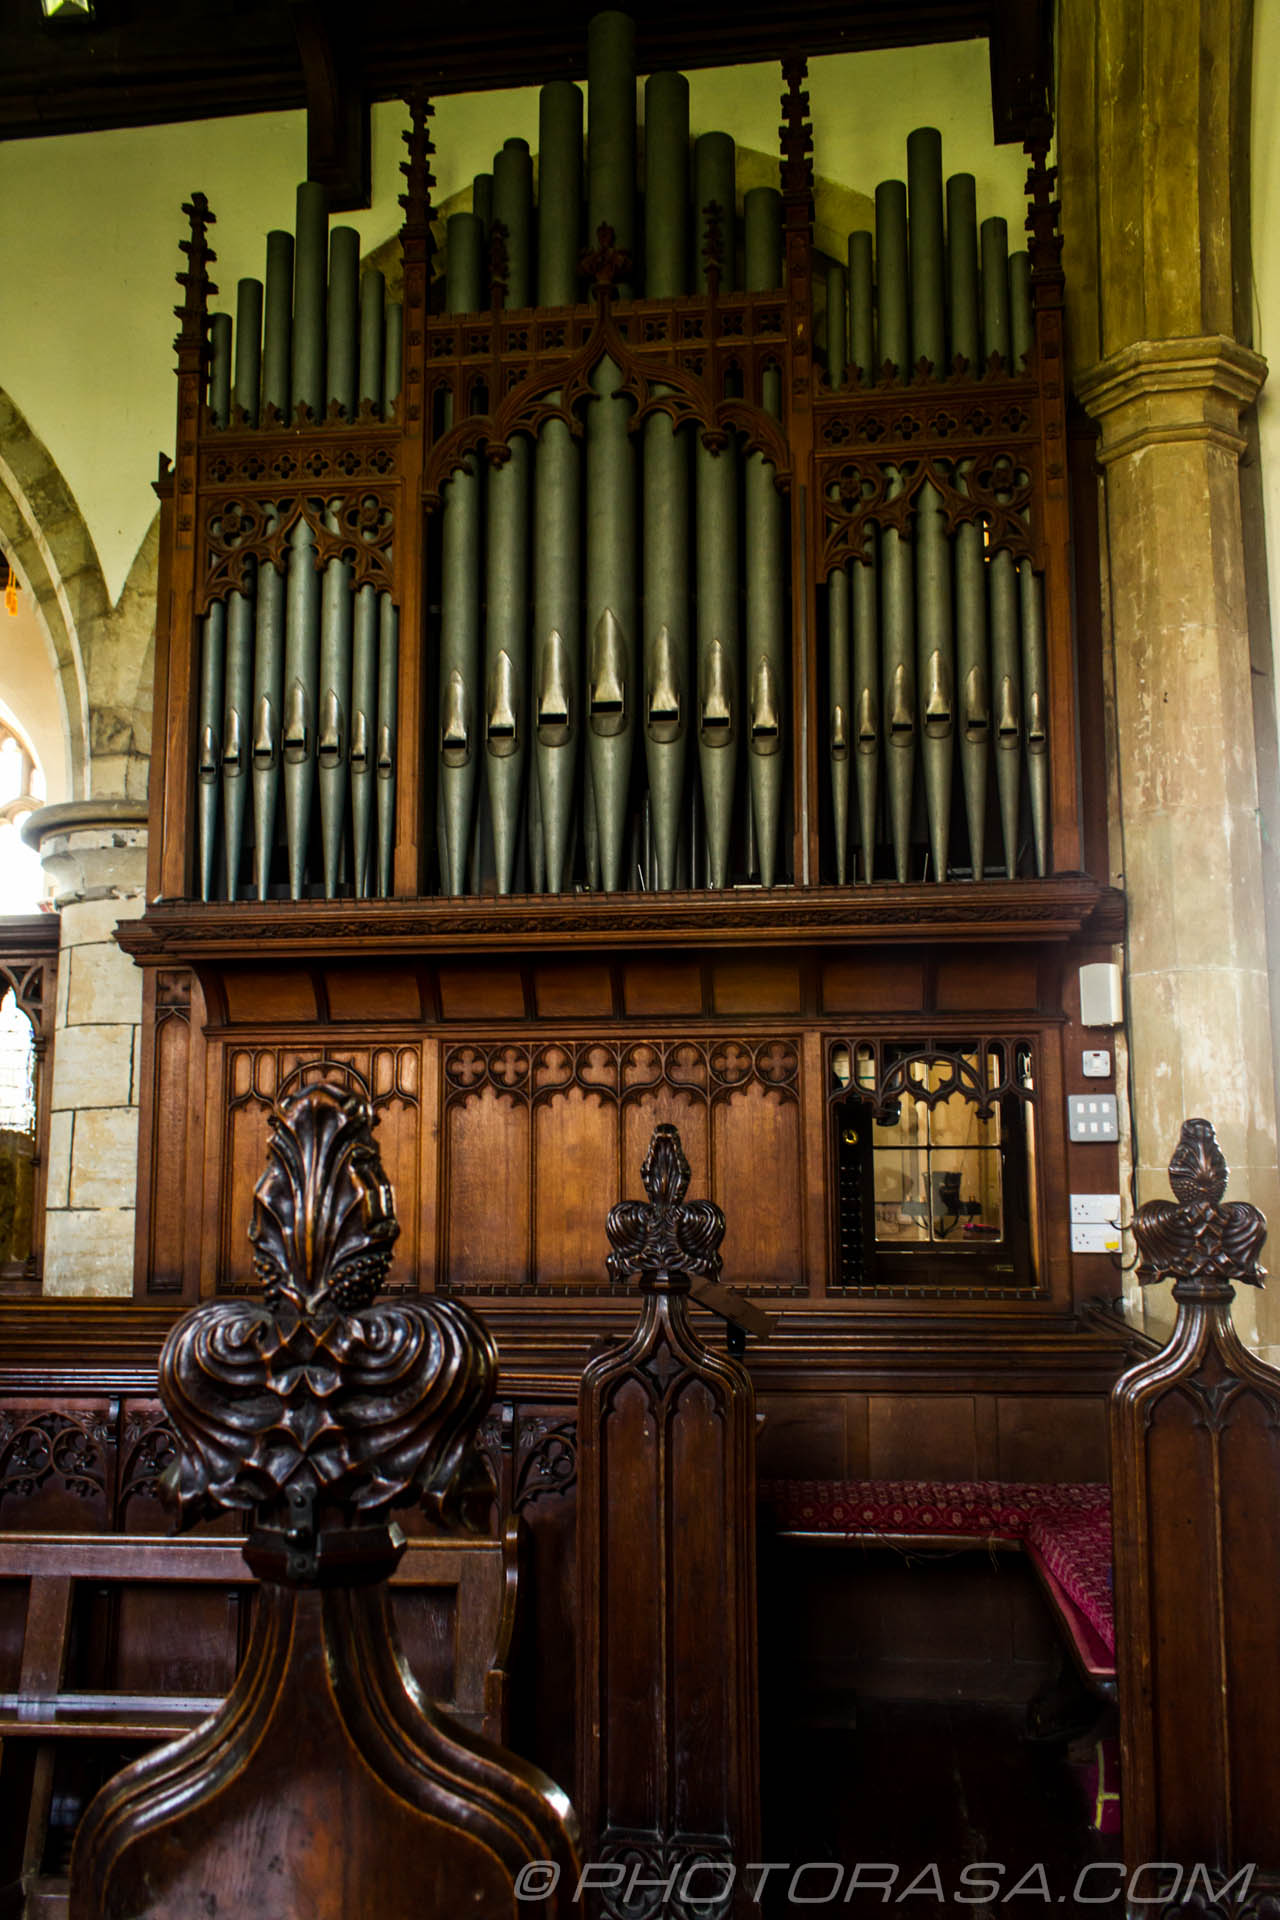 https://photorasa.com/saints-church-staplehurst-kent/organ-and-pews/